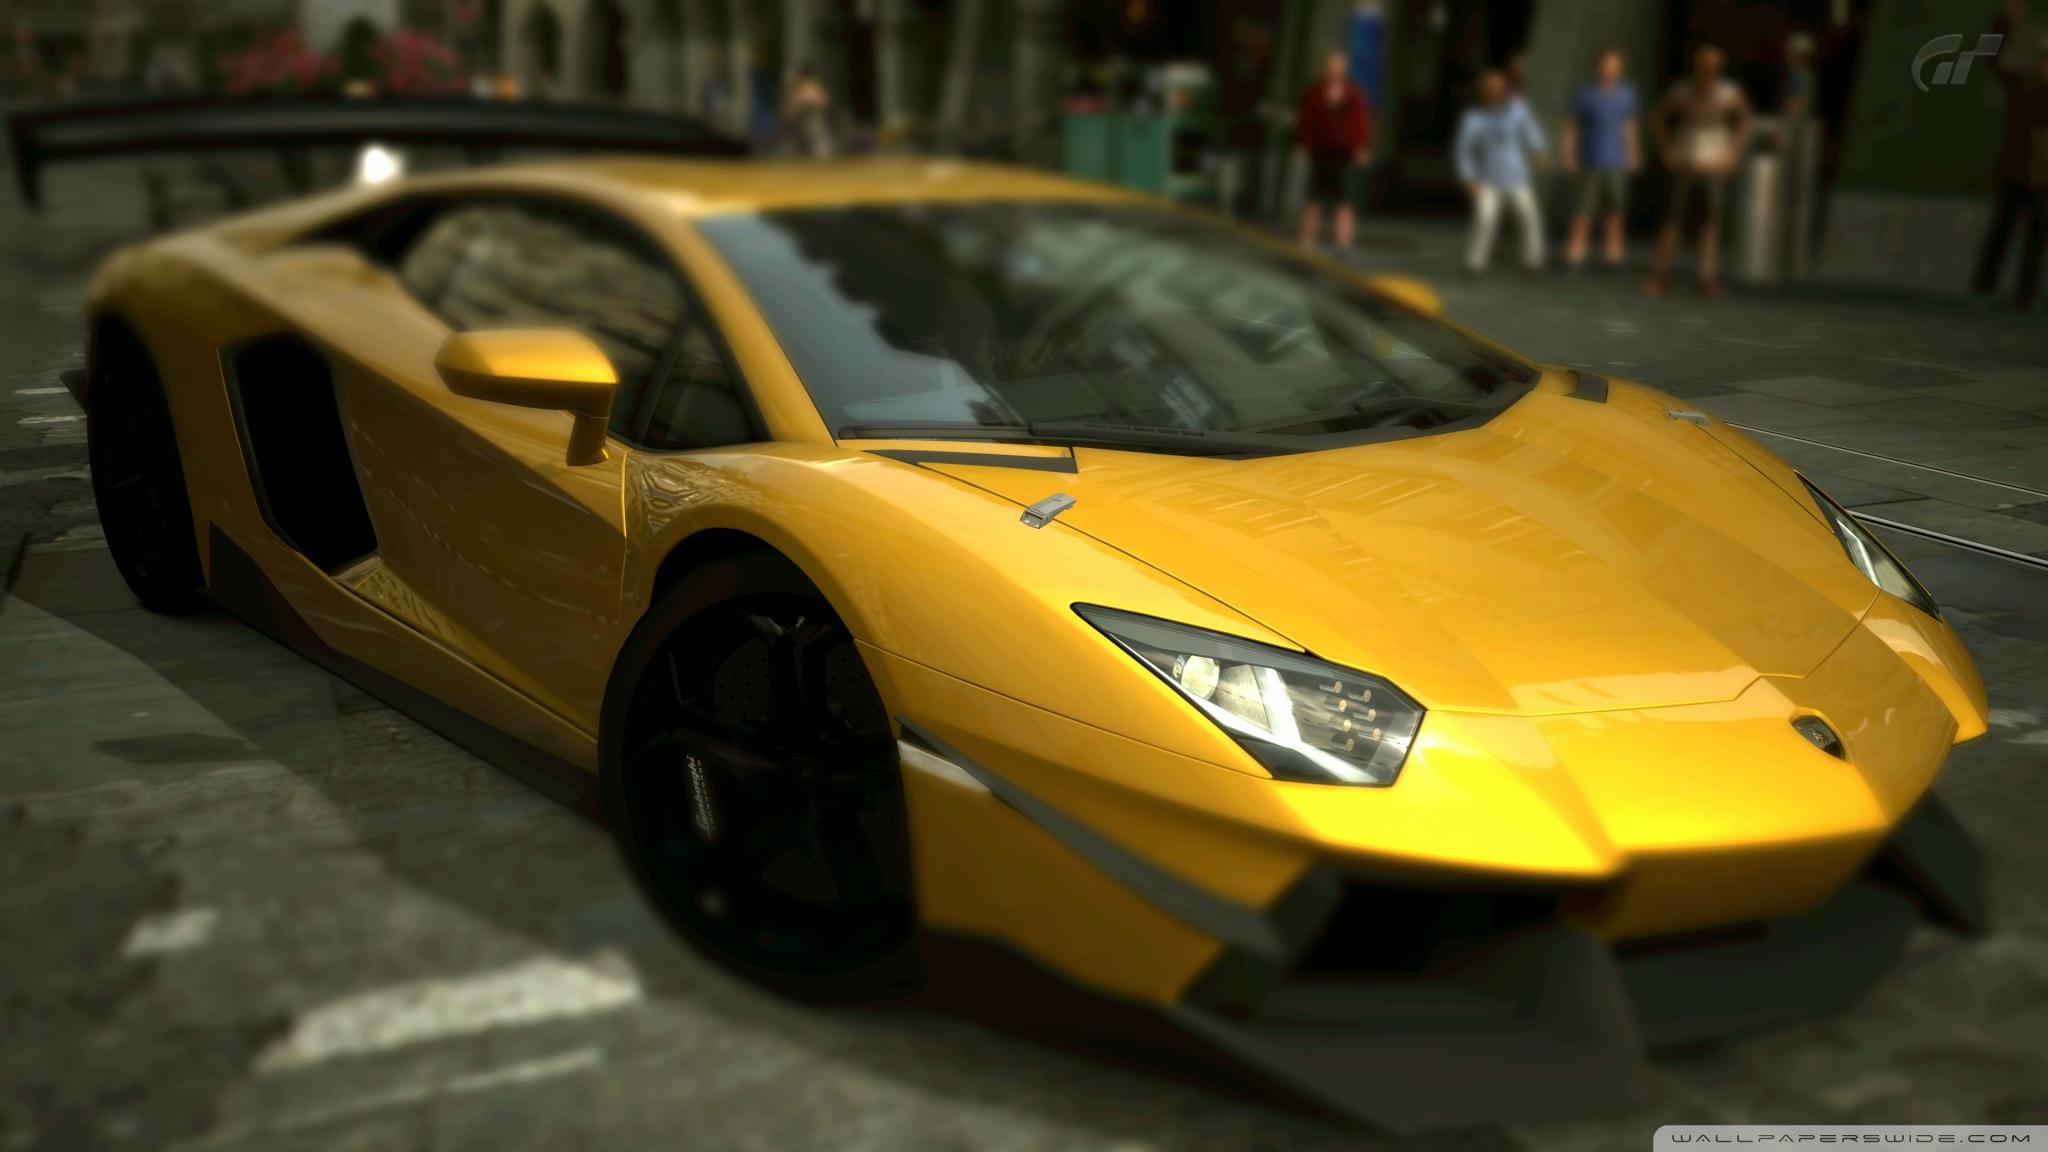 4k Red And Yellow Car Wallpaper Lamborghini Aventador Lp700 4 Inca Gold Yellow 4k Hd